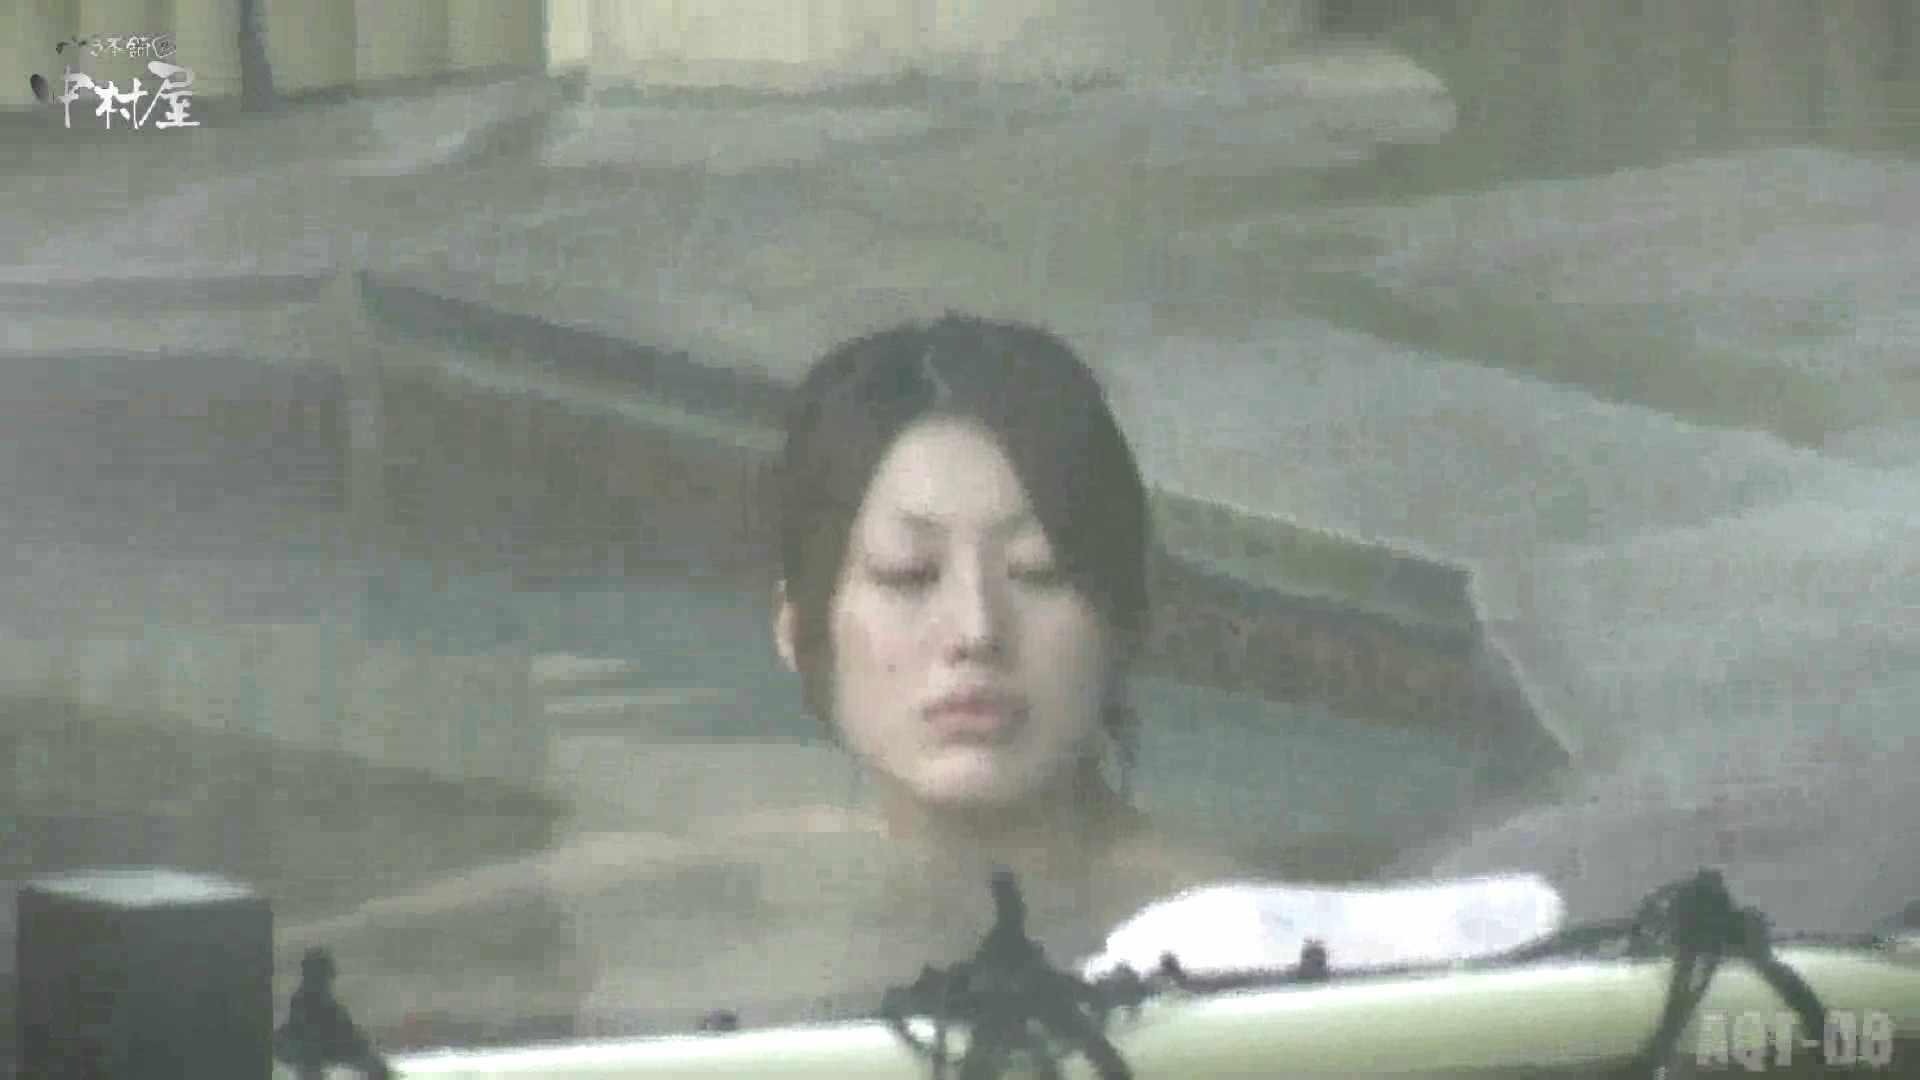 Aquaな露天風呂Vol.872潜入盗撮露天風呂八判湯 其の三 OLセックス  106画像 72